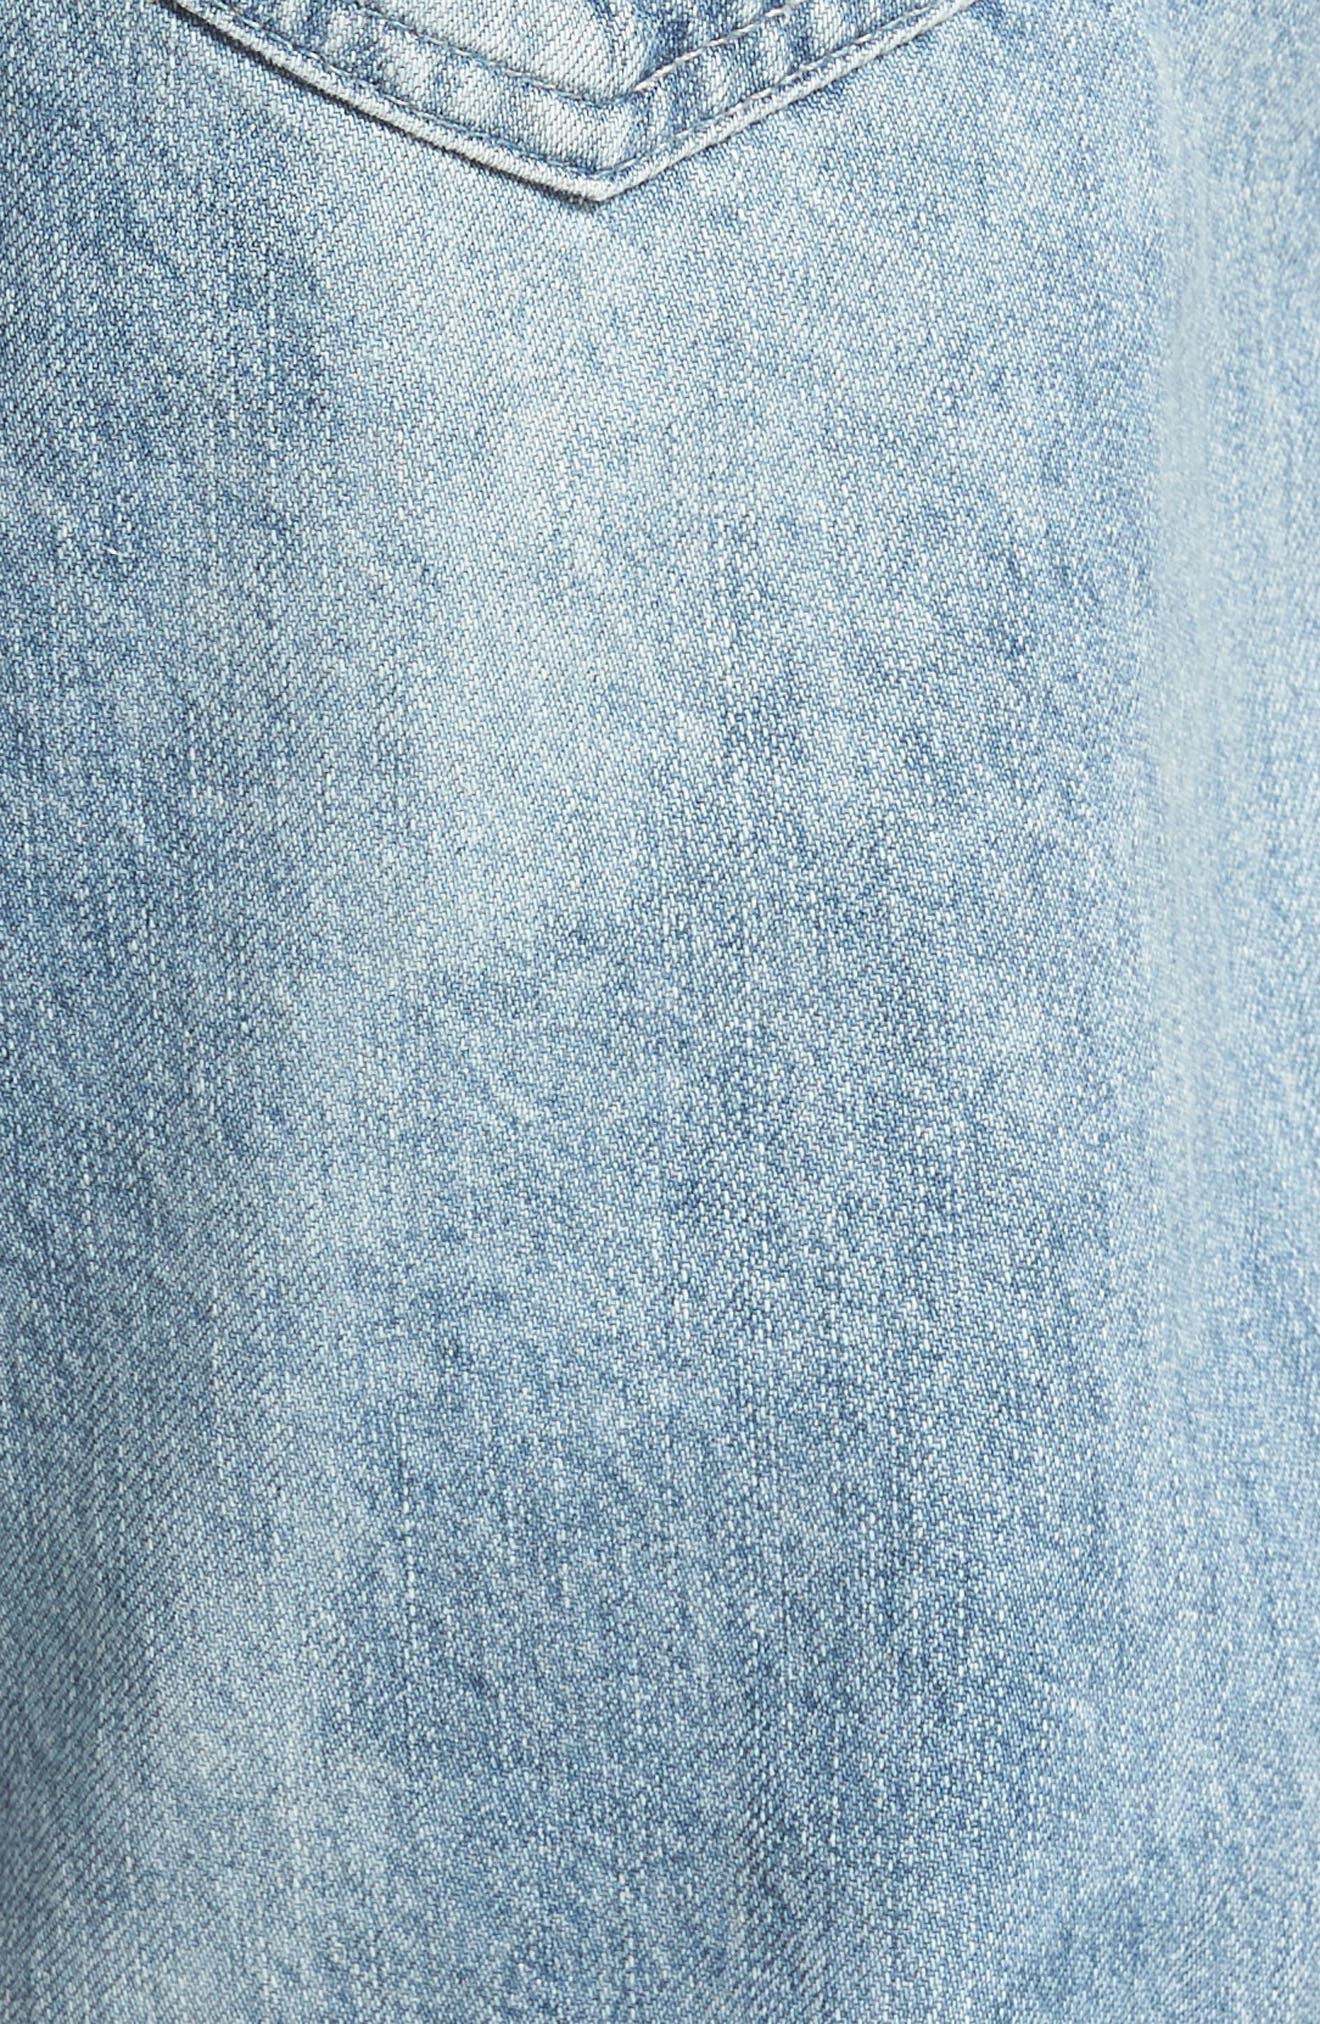 Tellis Slim Fit Jeans,                             Alternate thumbnail 5, color,                             461